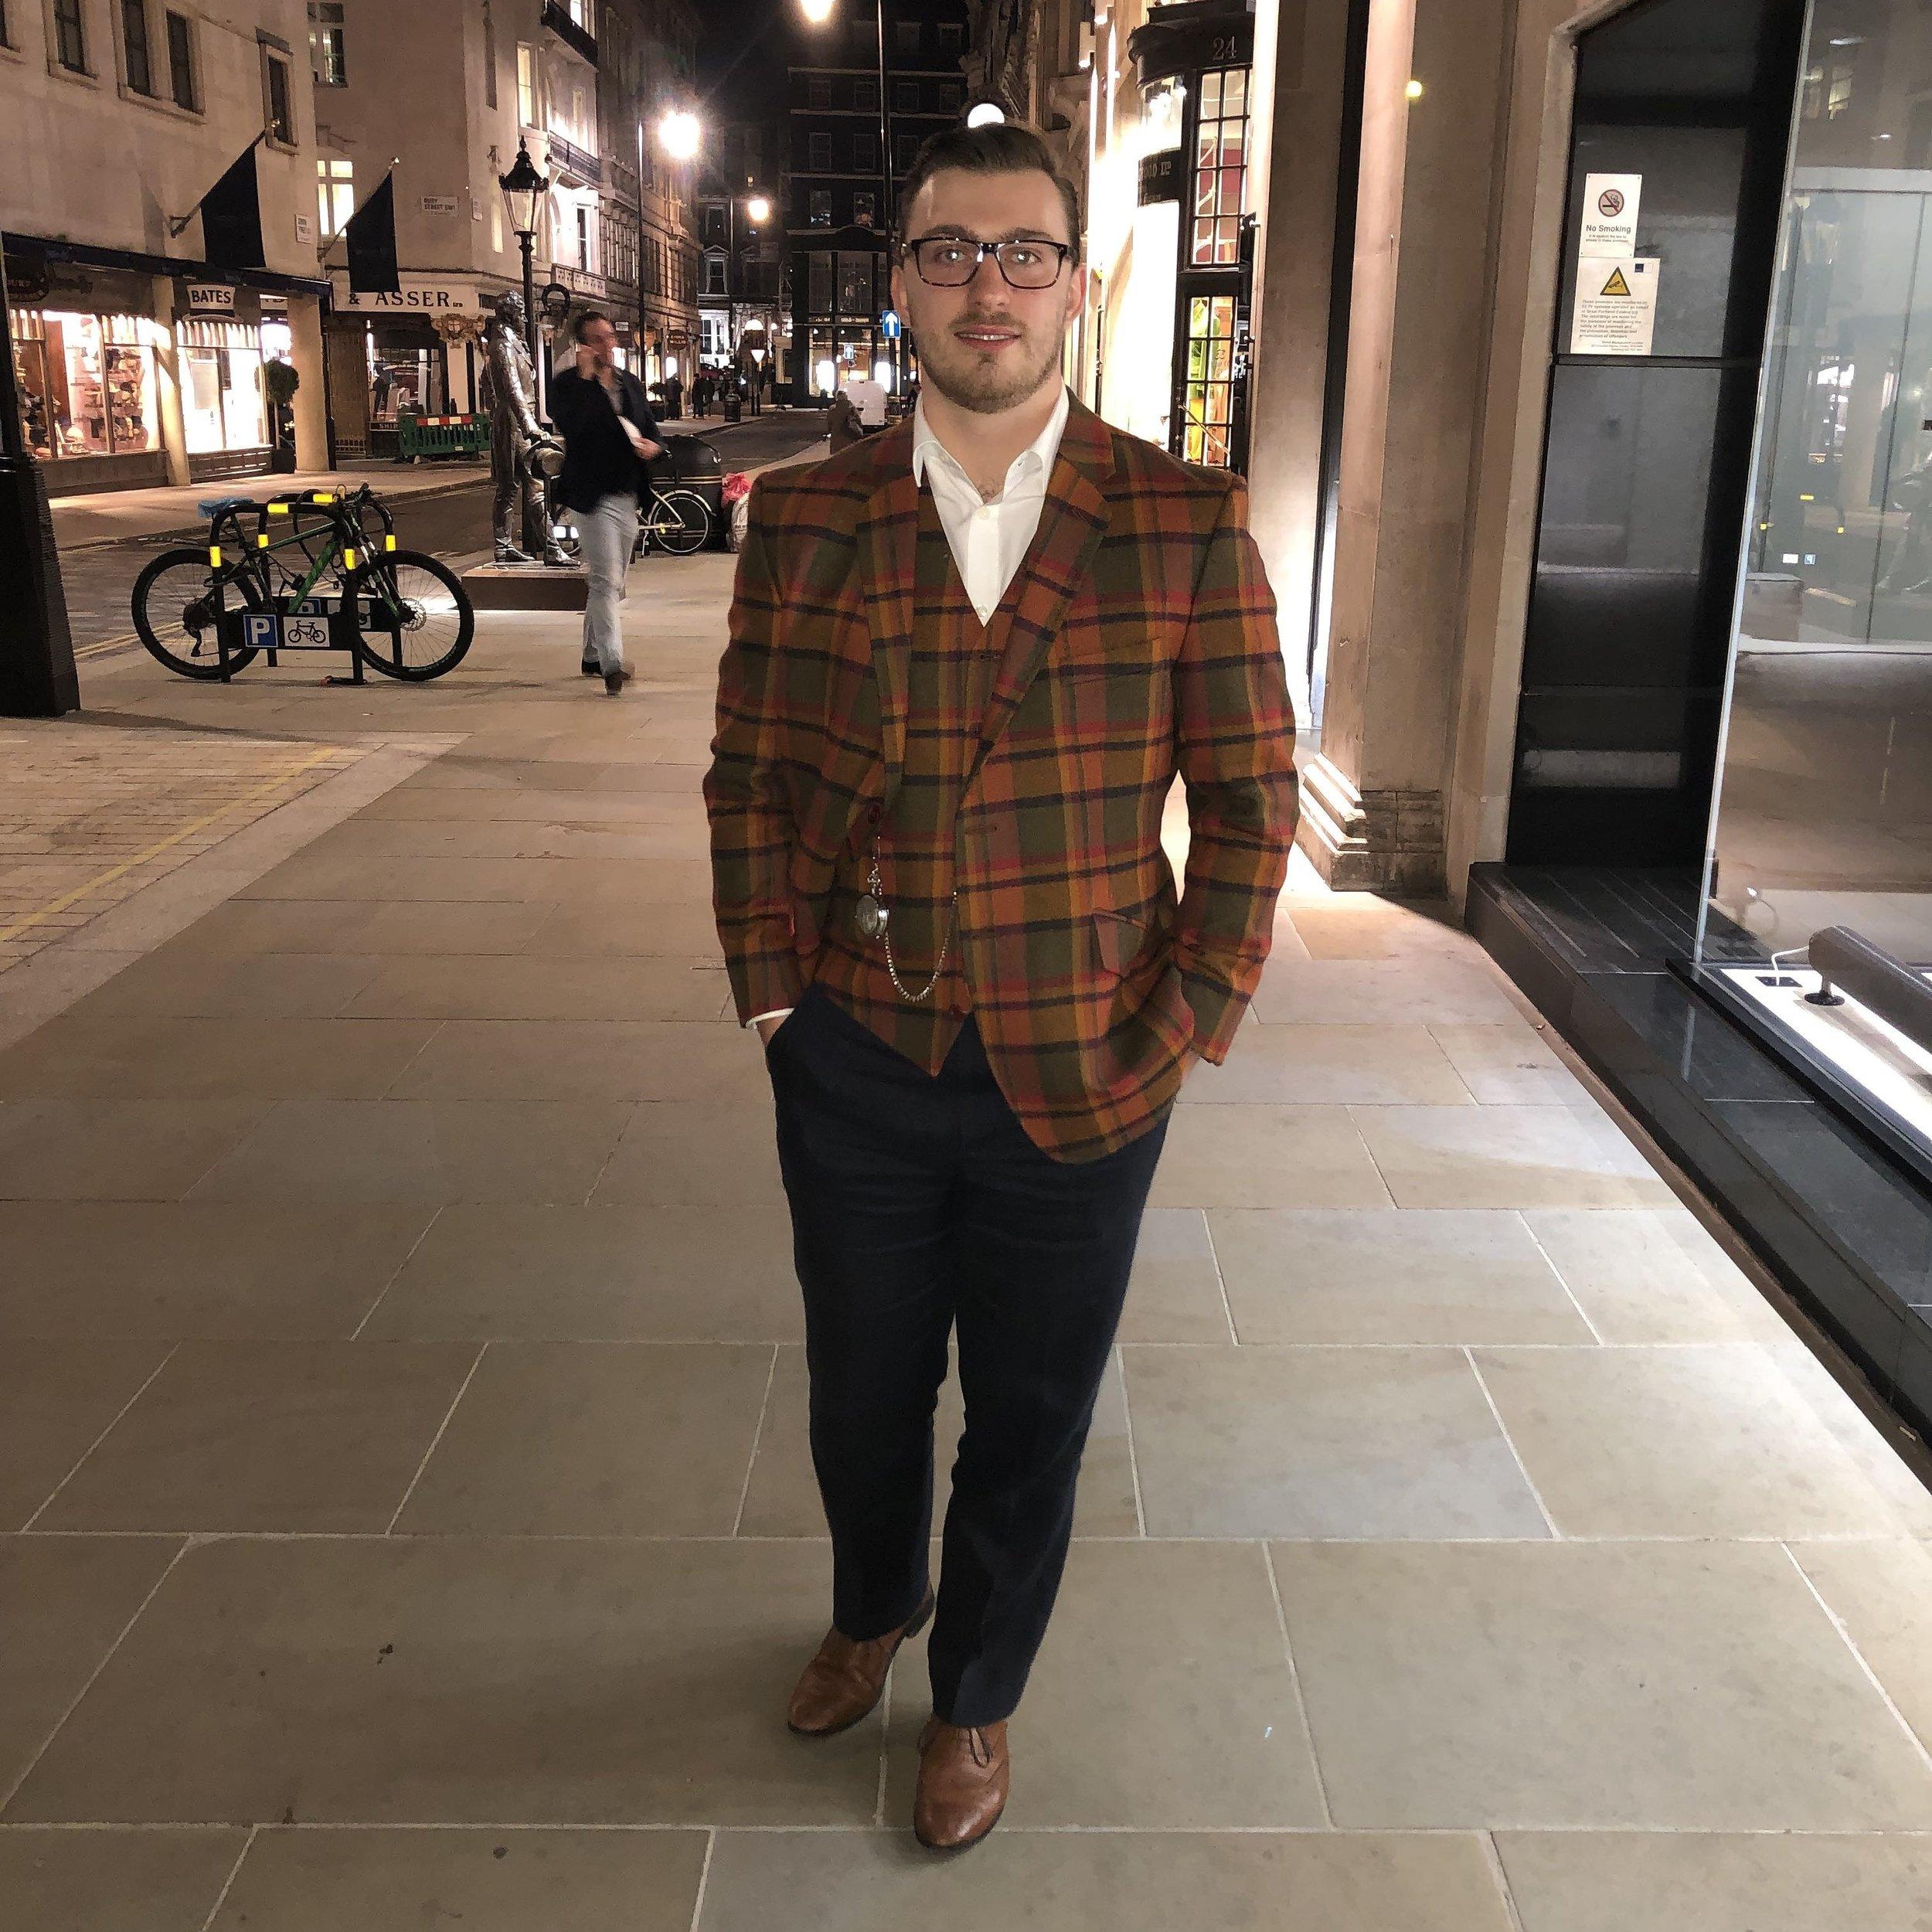 susannah-hall-tailor-bespoke-style-fox-brothers-tweed-flannel-suit-made-uk-british.jpg